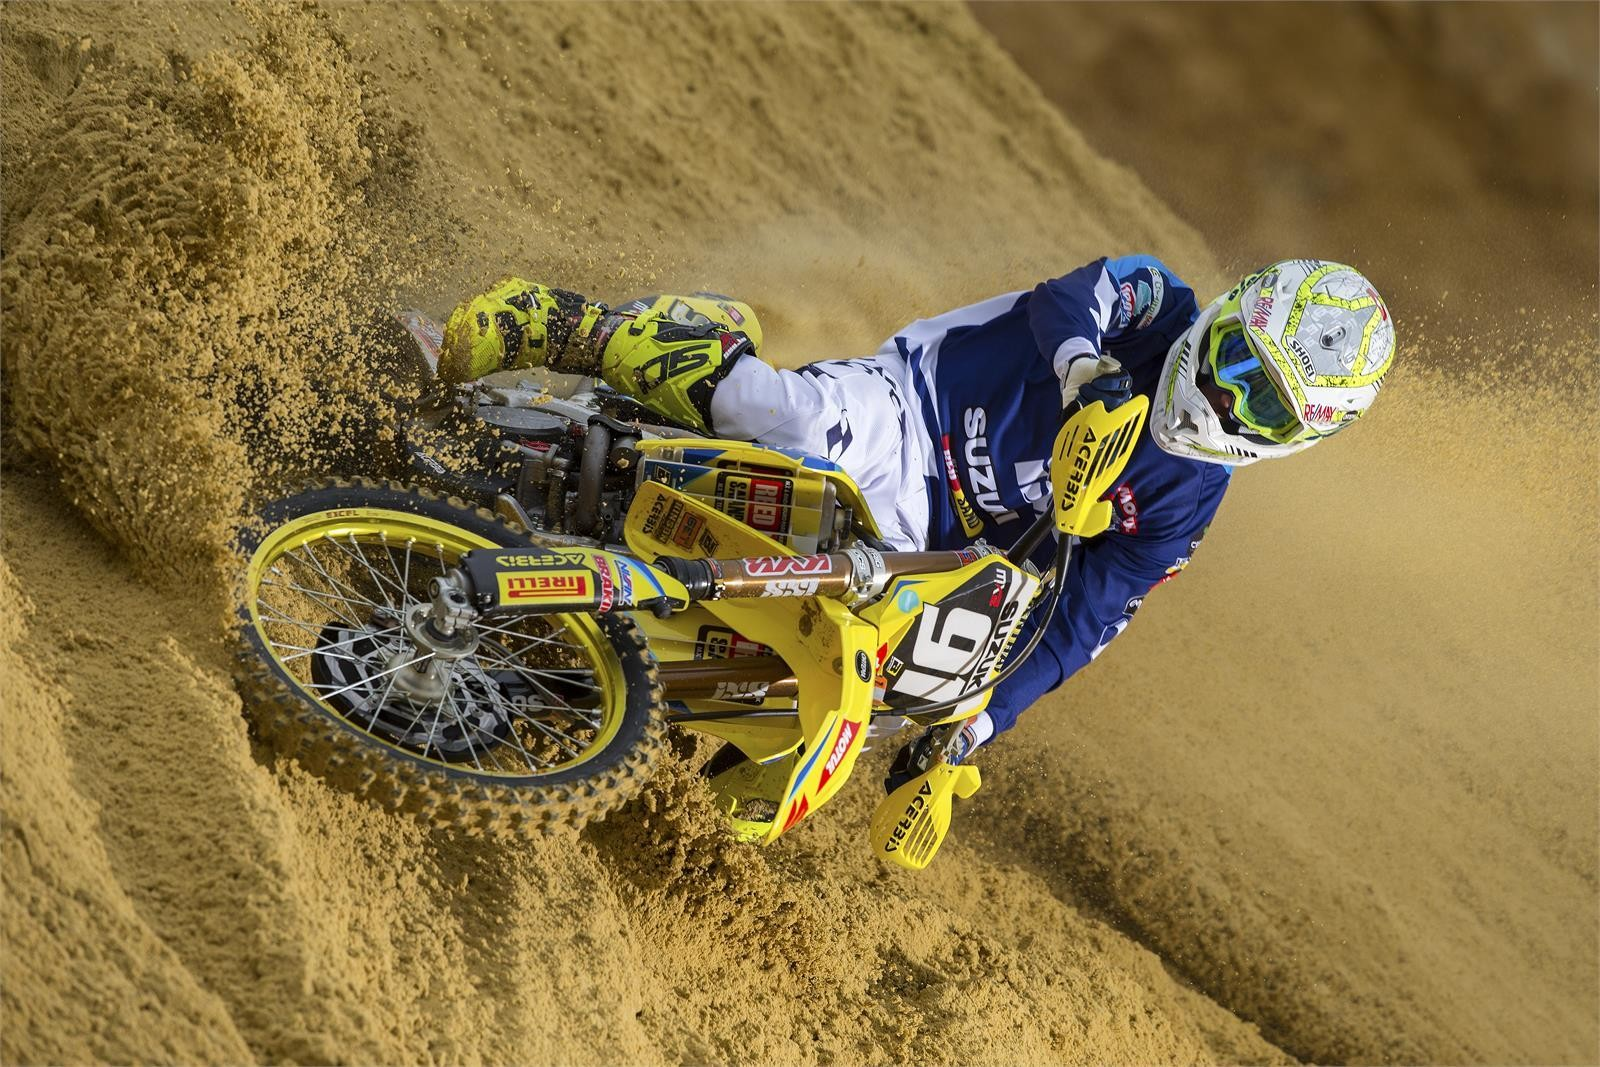 Jeremy Seewer - First Look: 2017 Suzuki World MX2 Team - Motocross Pictures - Vital MX